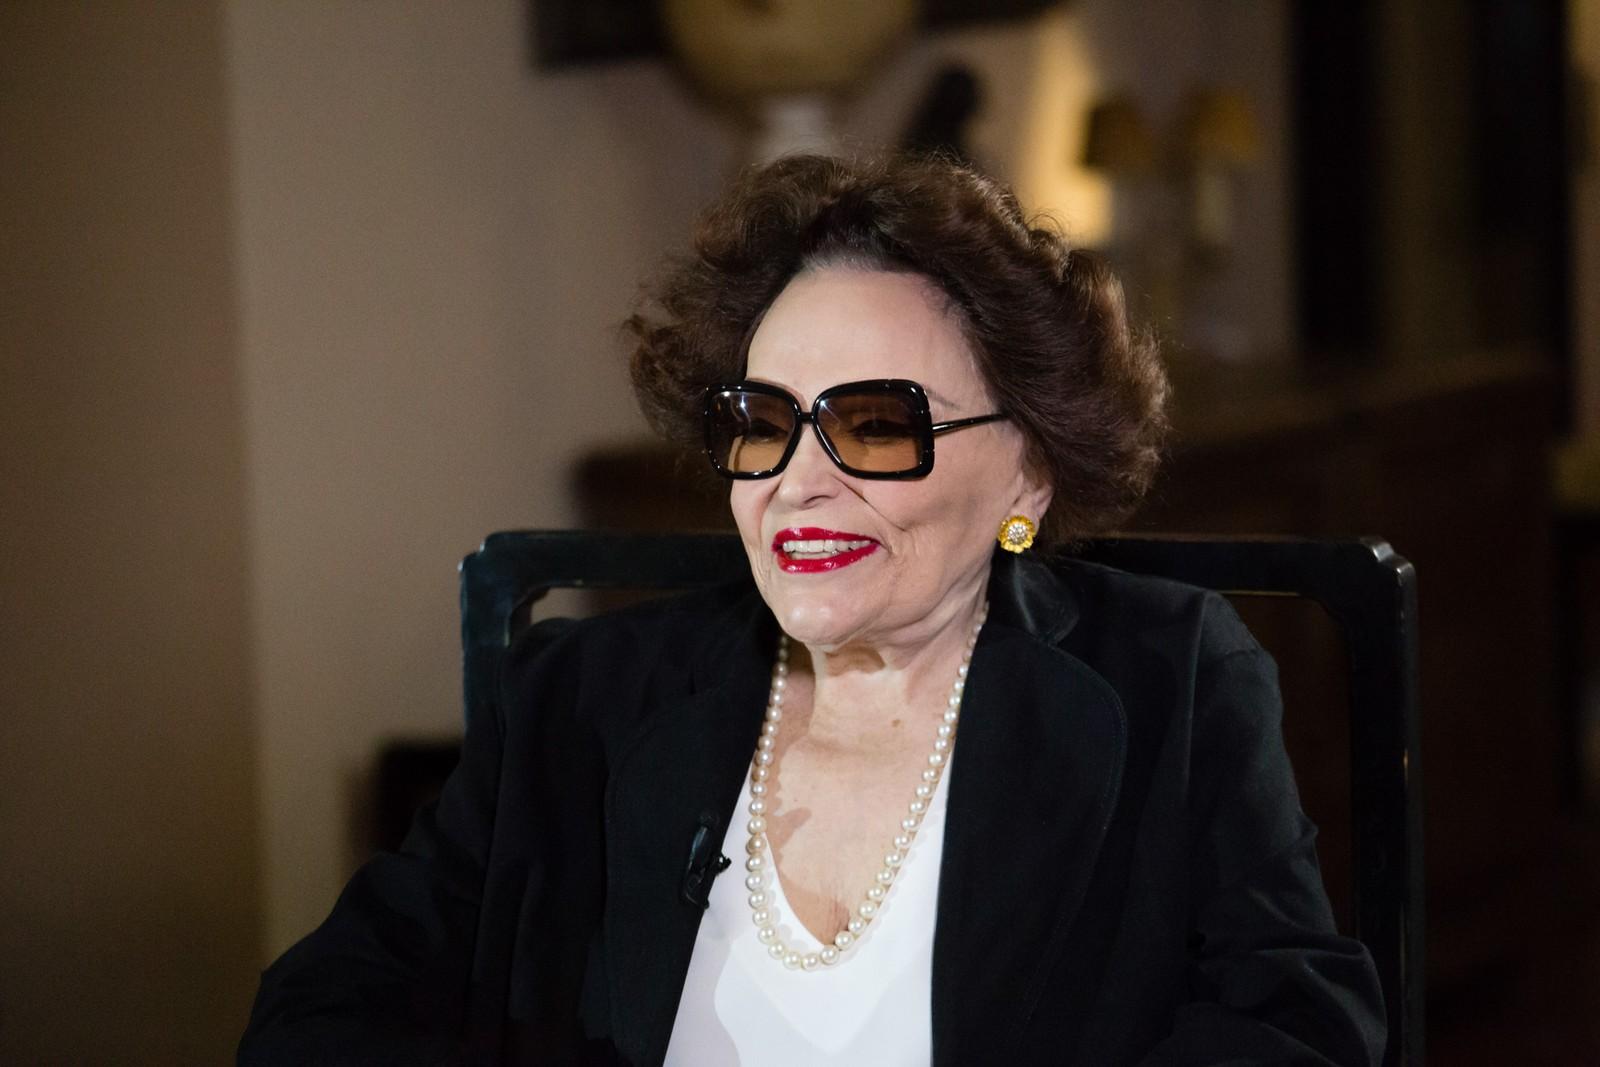 Morre Bibi Ferreira, aos 96 anos